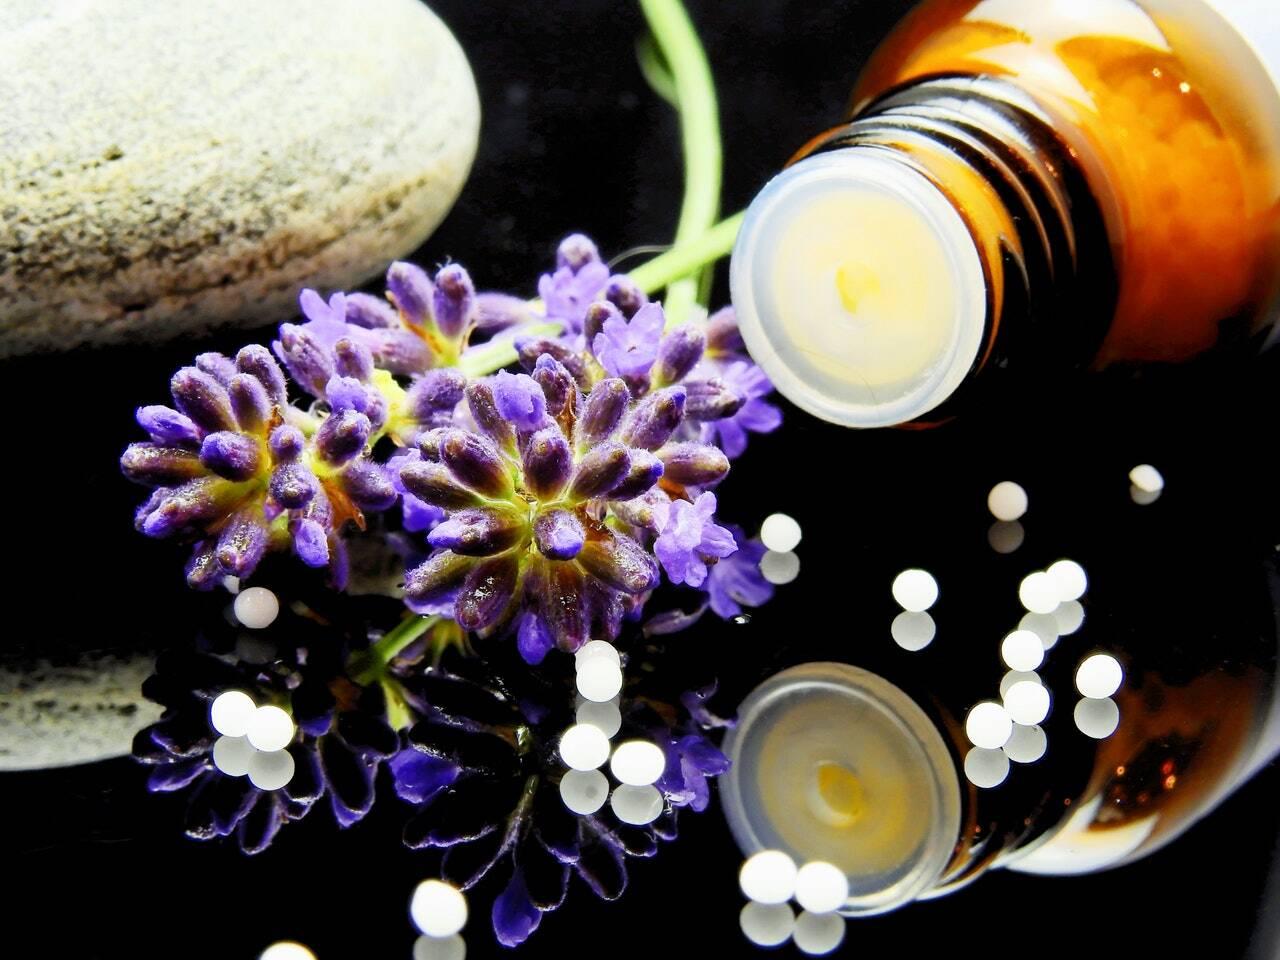 Homeopatia - Foto Pixabay